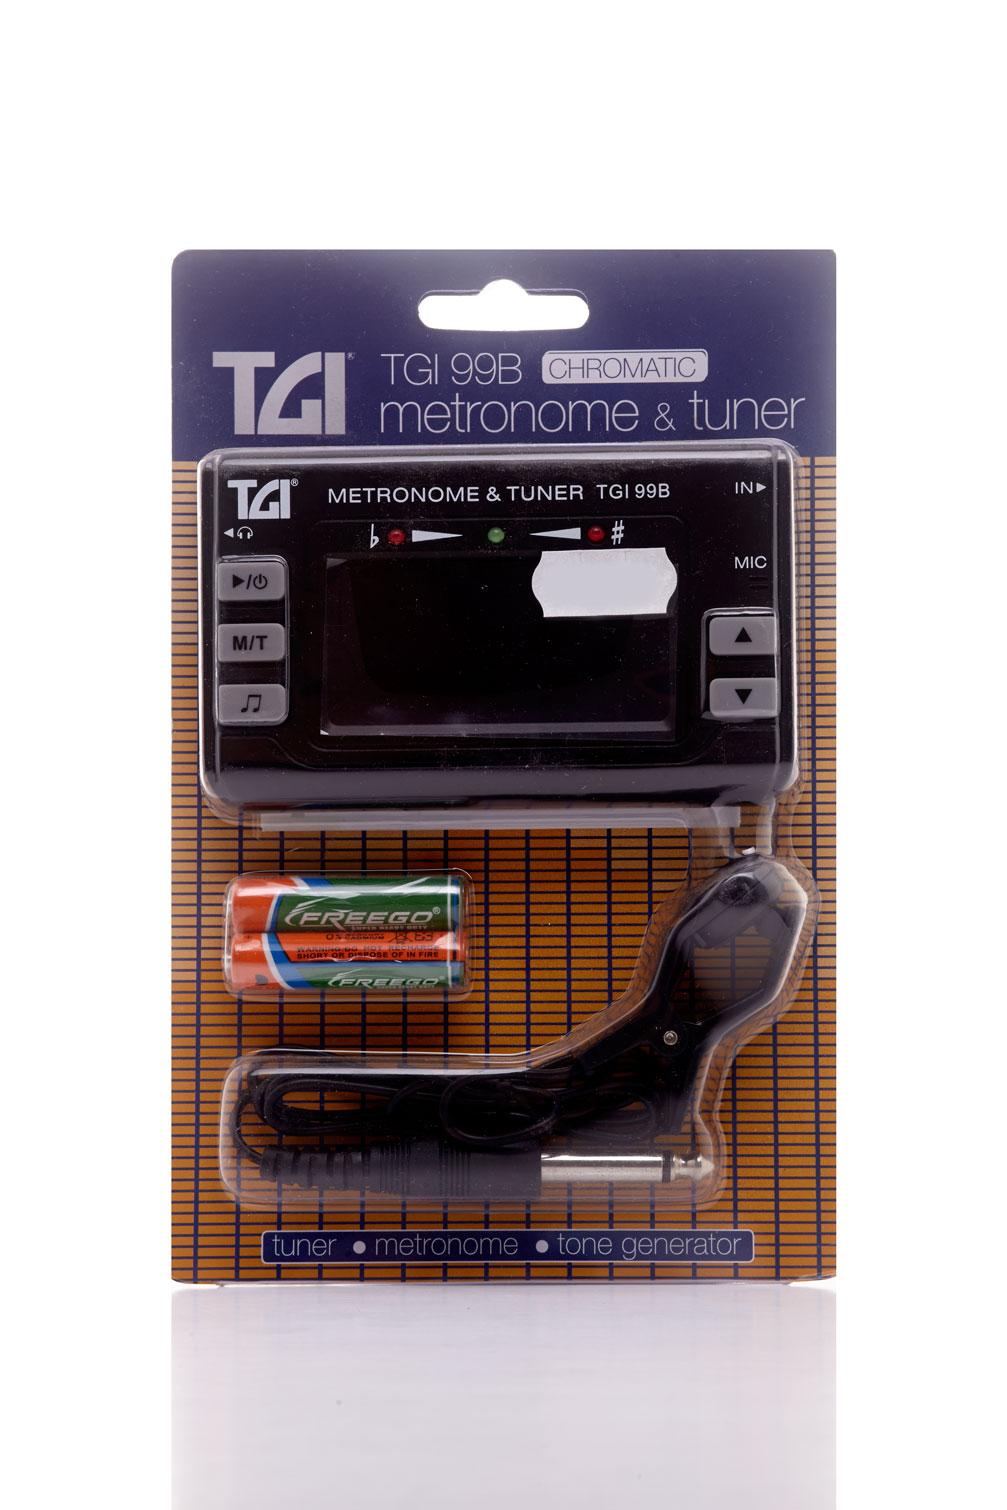 Mini Chromatic Metronome & Tuner